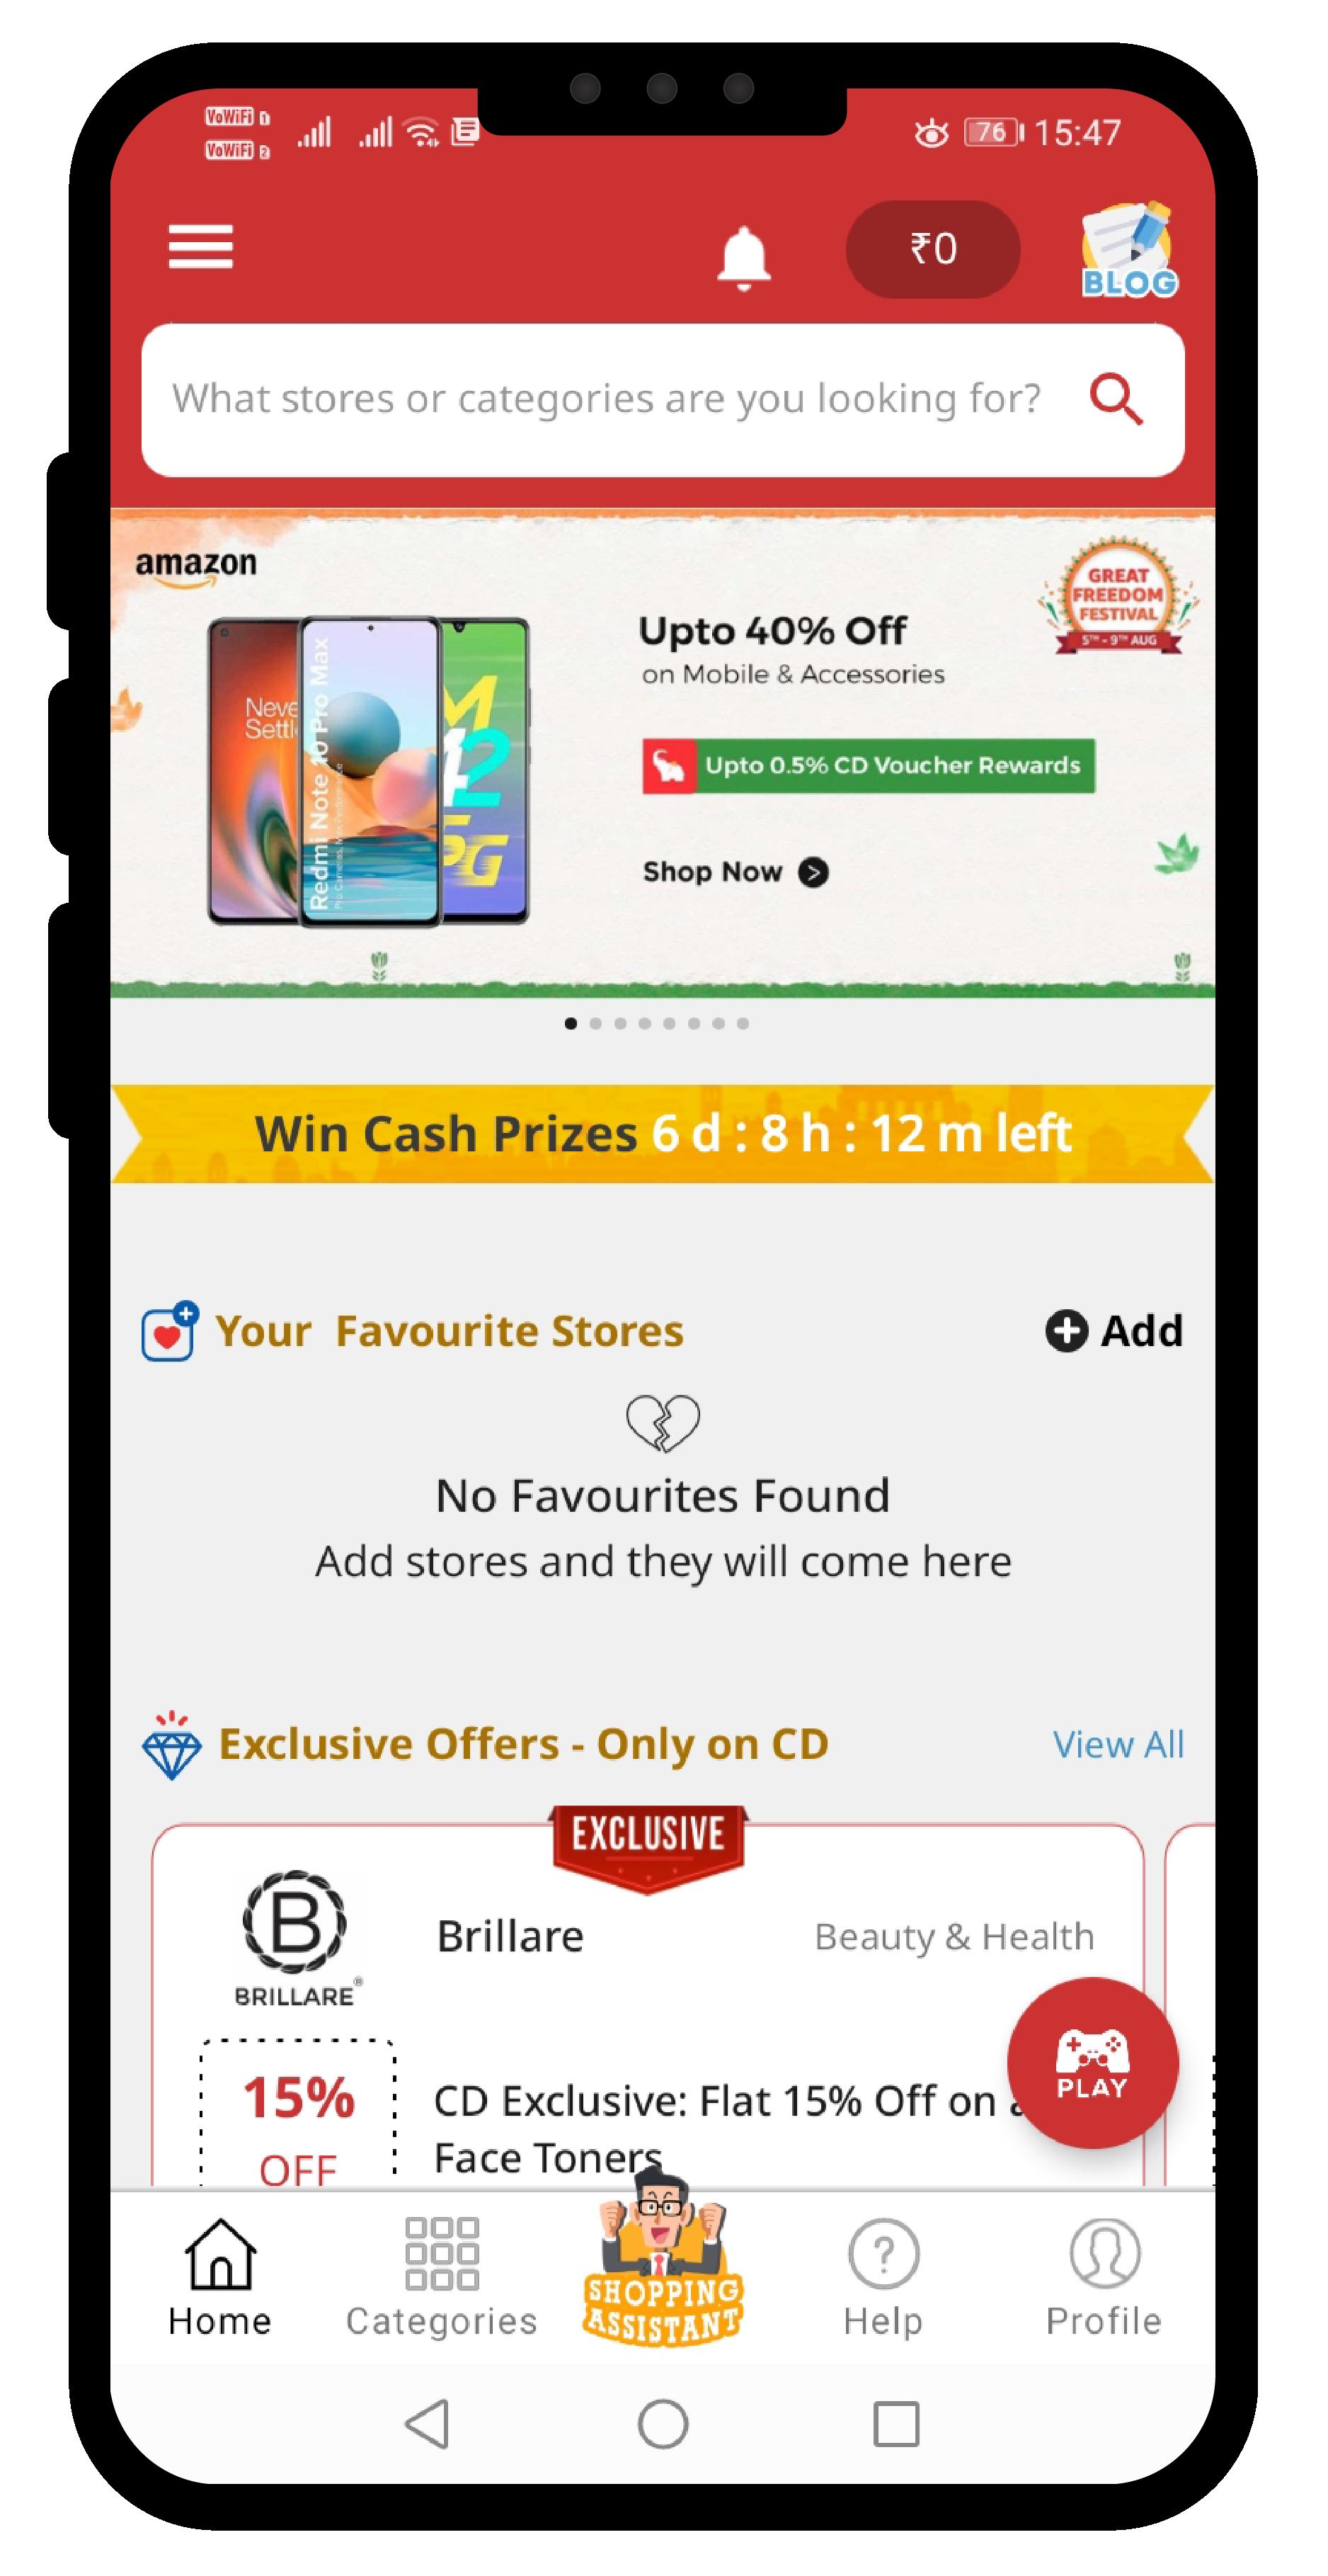 , Reliable Top Cashback Apps You Must Use In 2021., Techweblabs - Web Development   Mobile App Development   Hyderabad